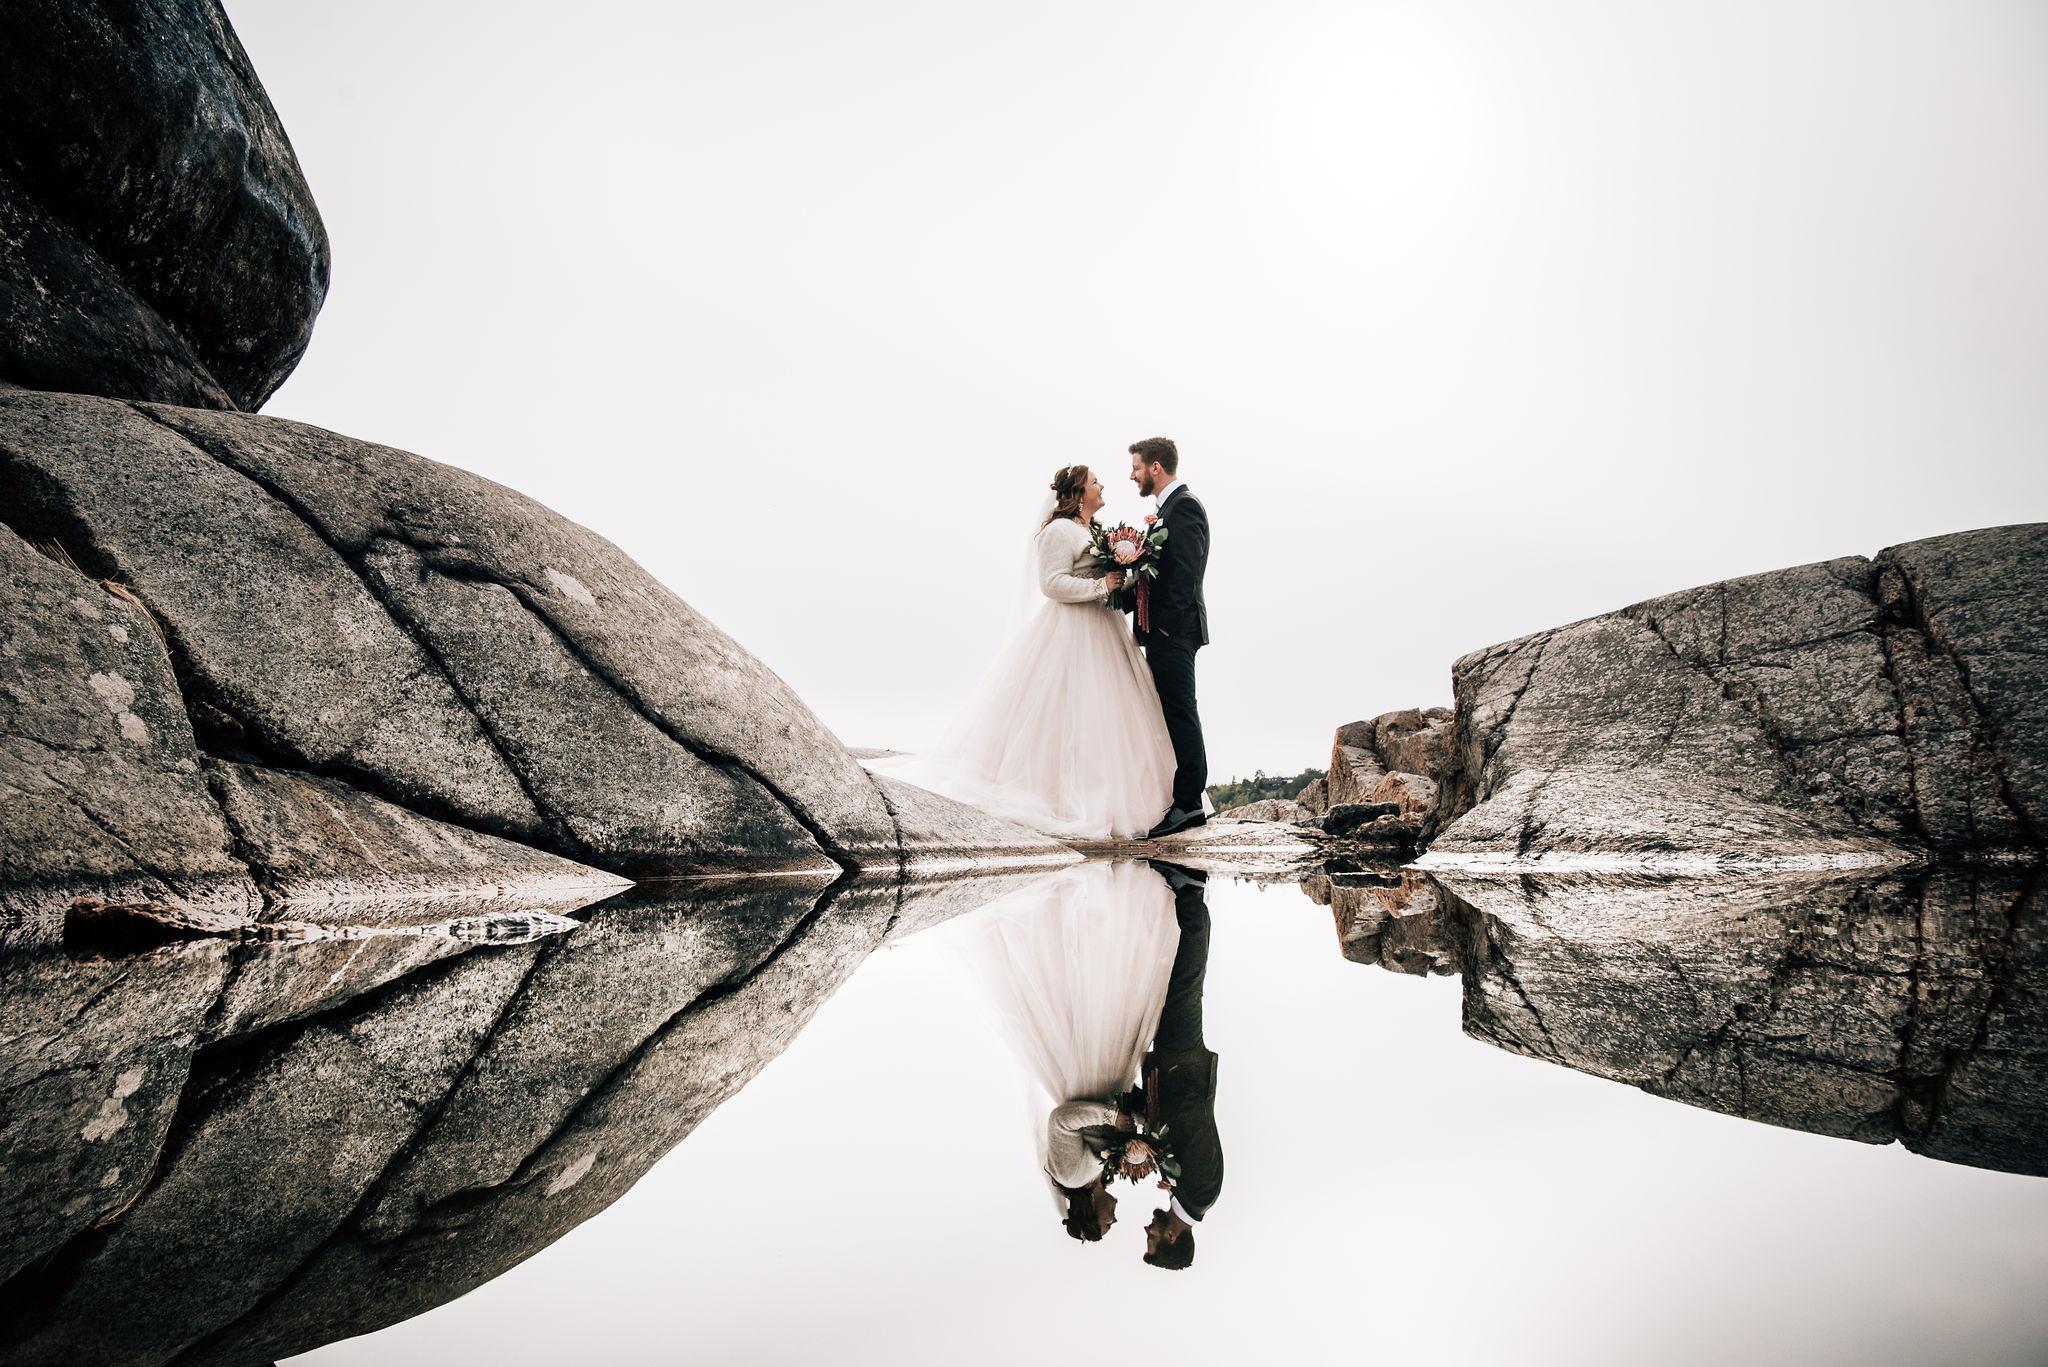 750_0045_fotografering_larvik_bryllup_aspargesgarden_.jpg